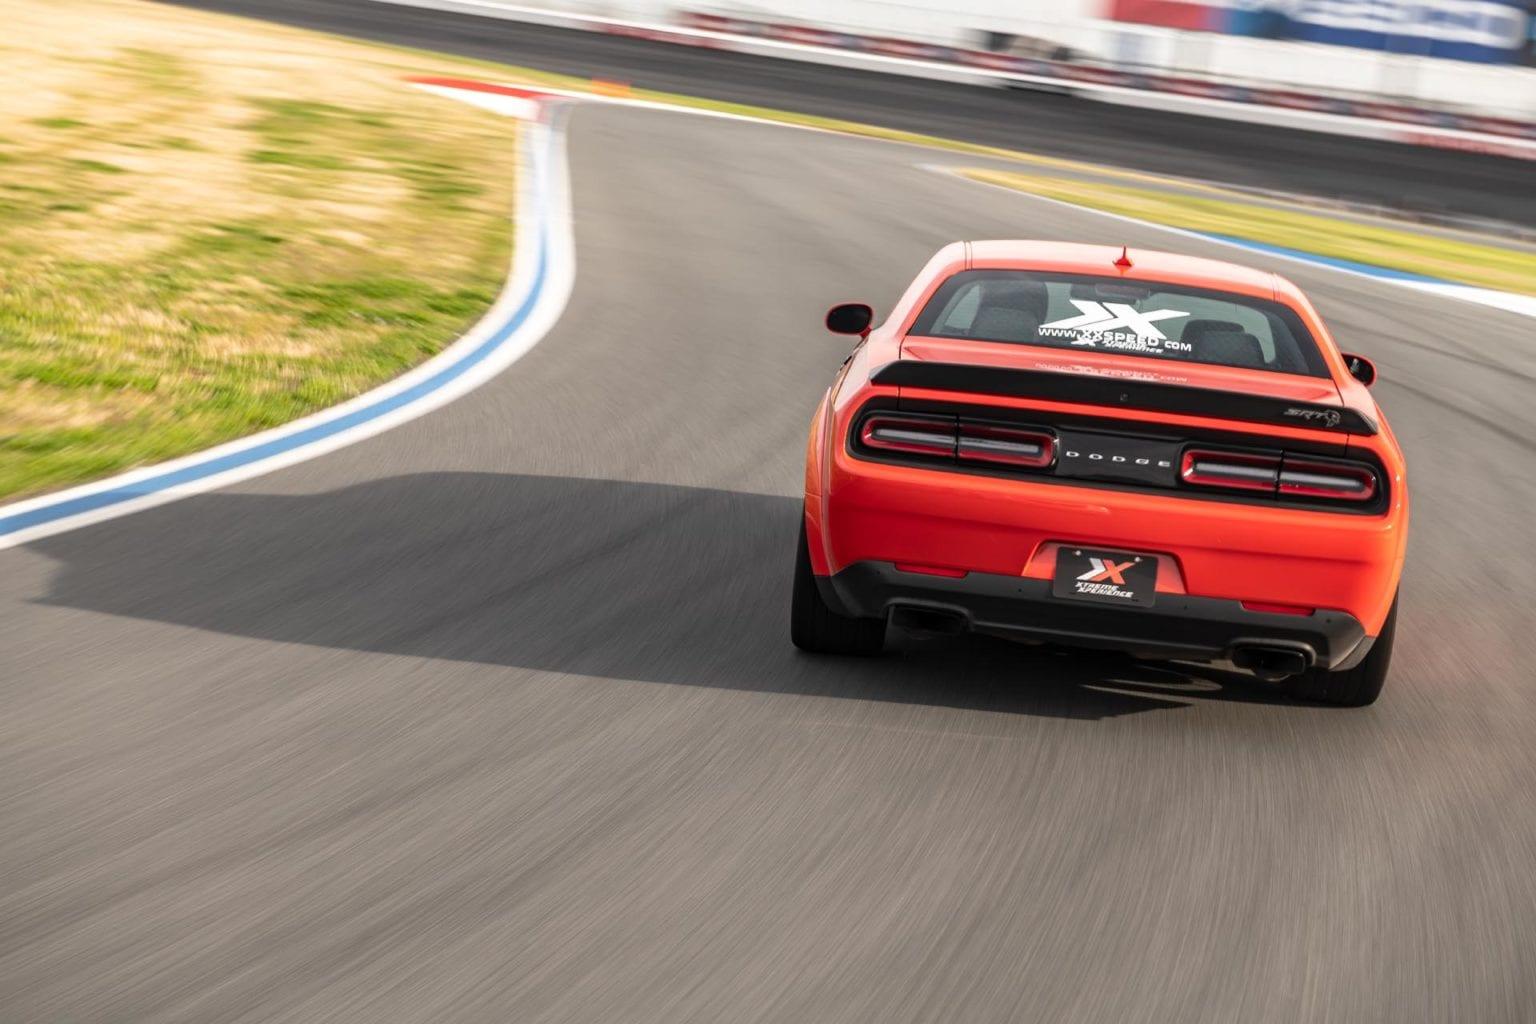 Default - Red Car